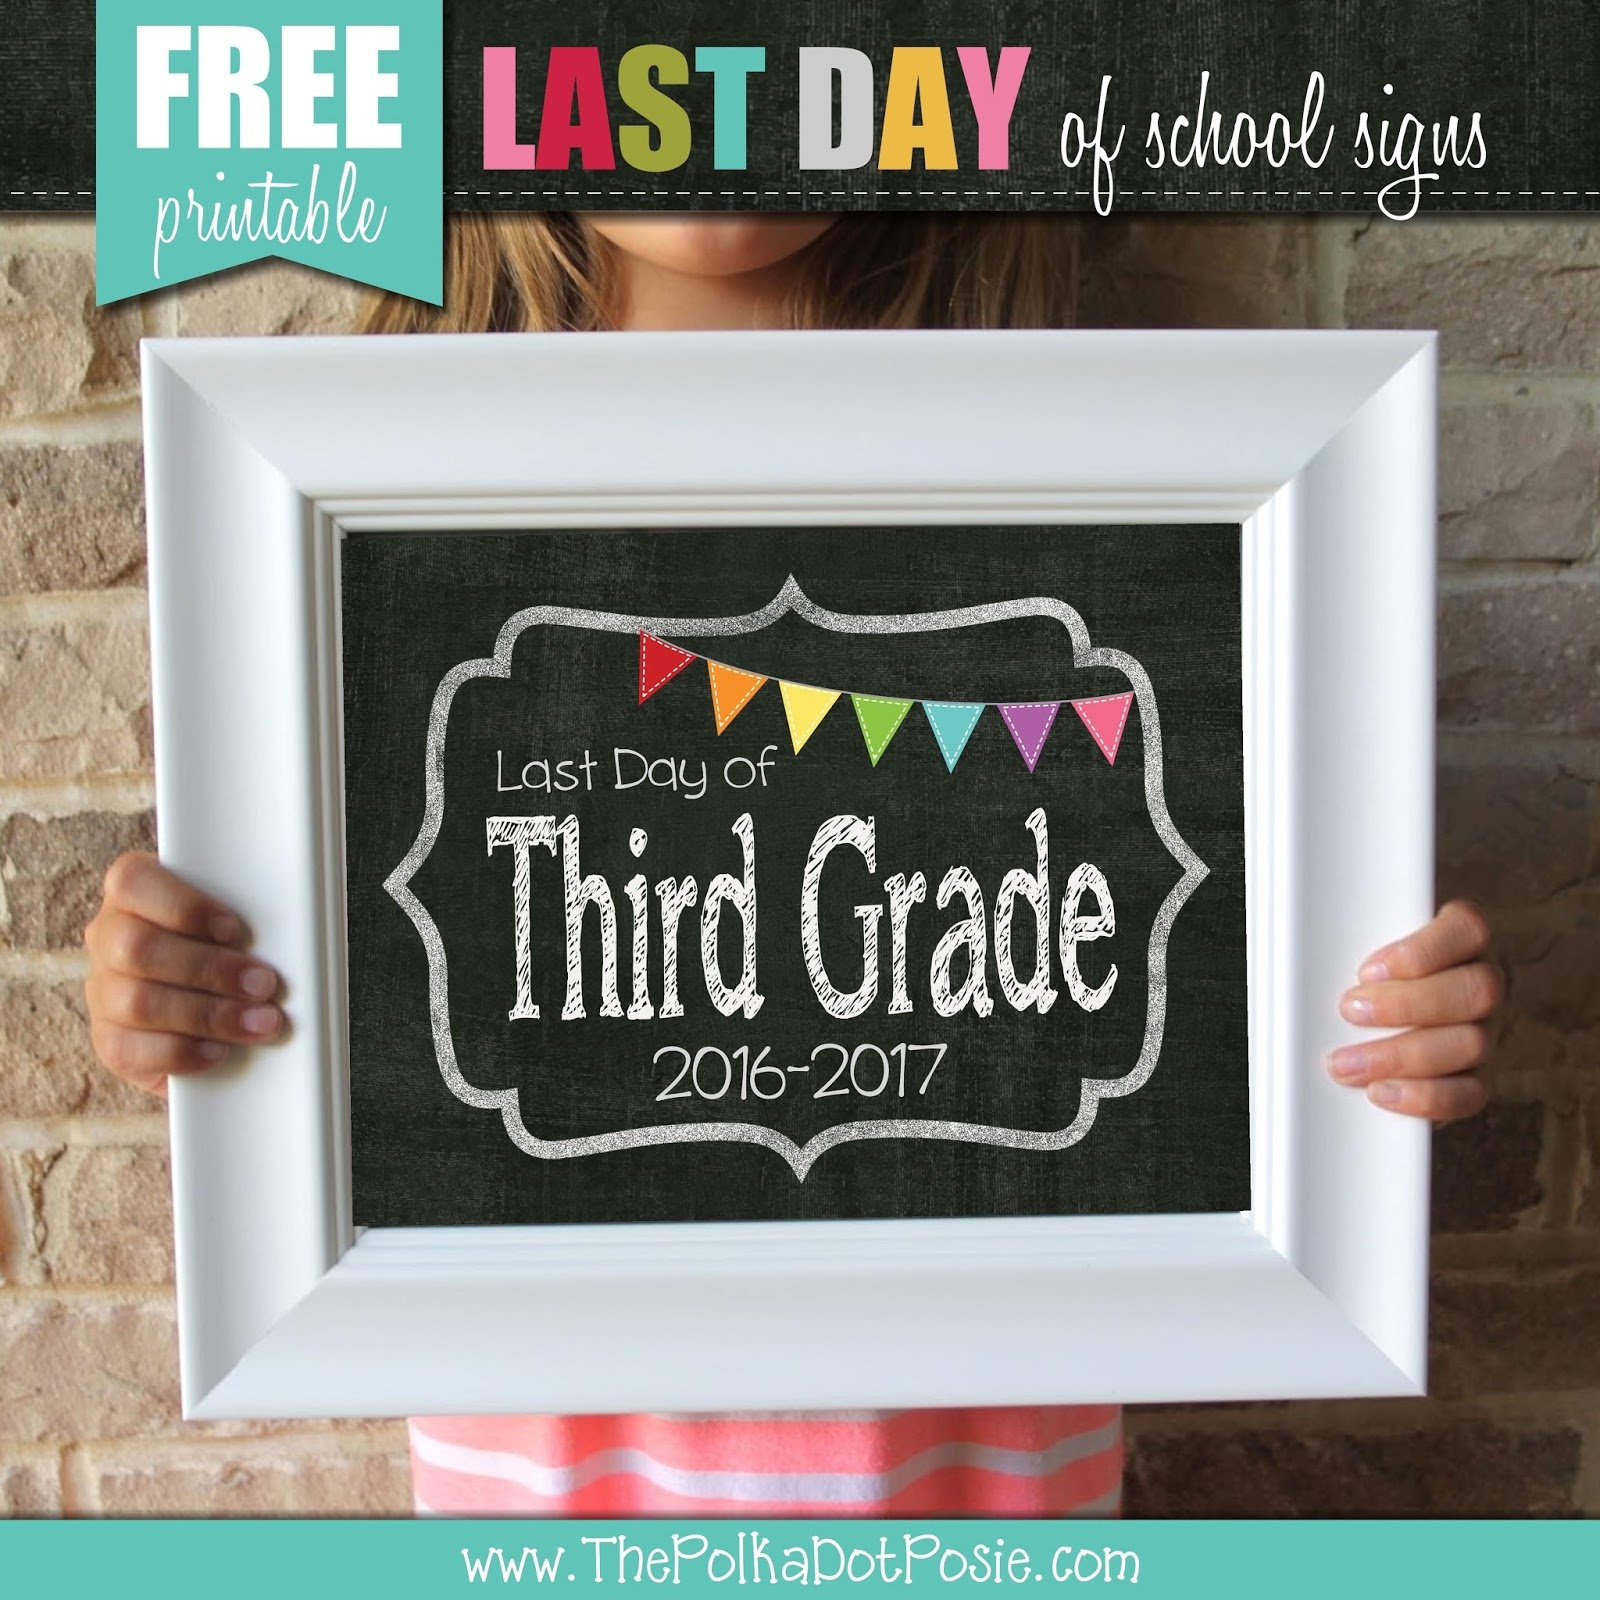 The Polka Dot Posie: Free Printable Last Day Of School Signs! - Free Printable Last Day Of School Signs 2017 2018